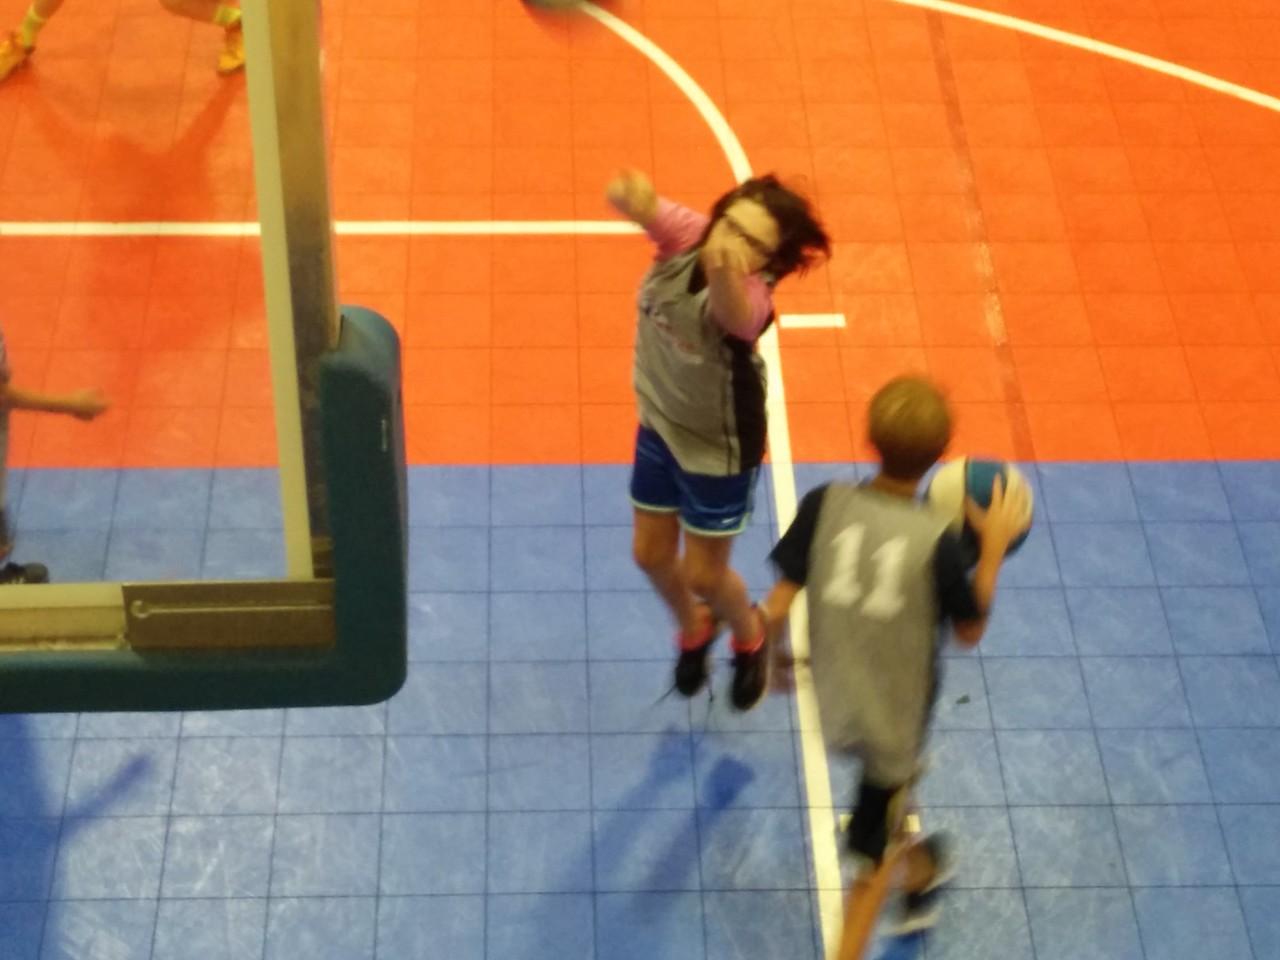 action shot!